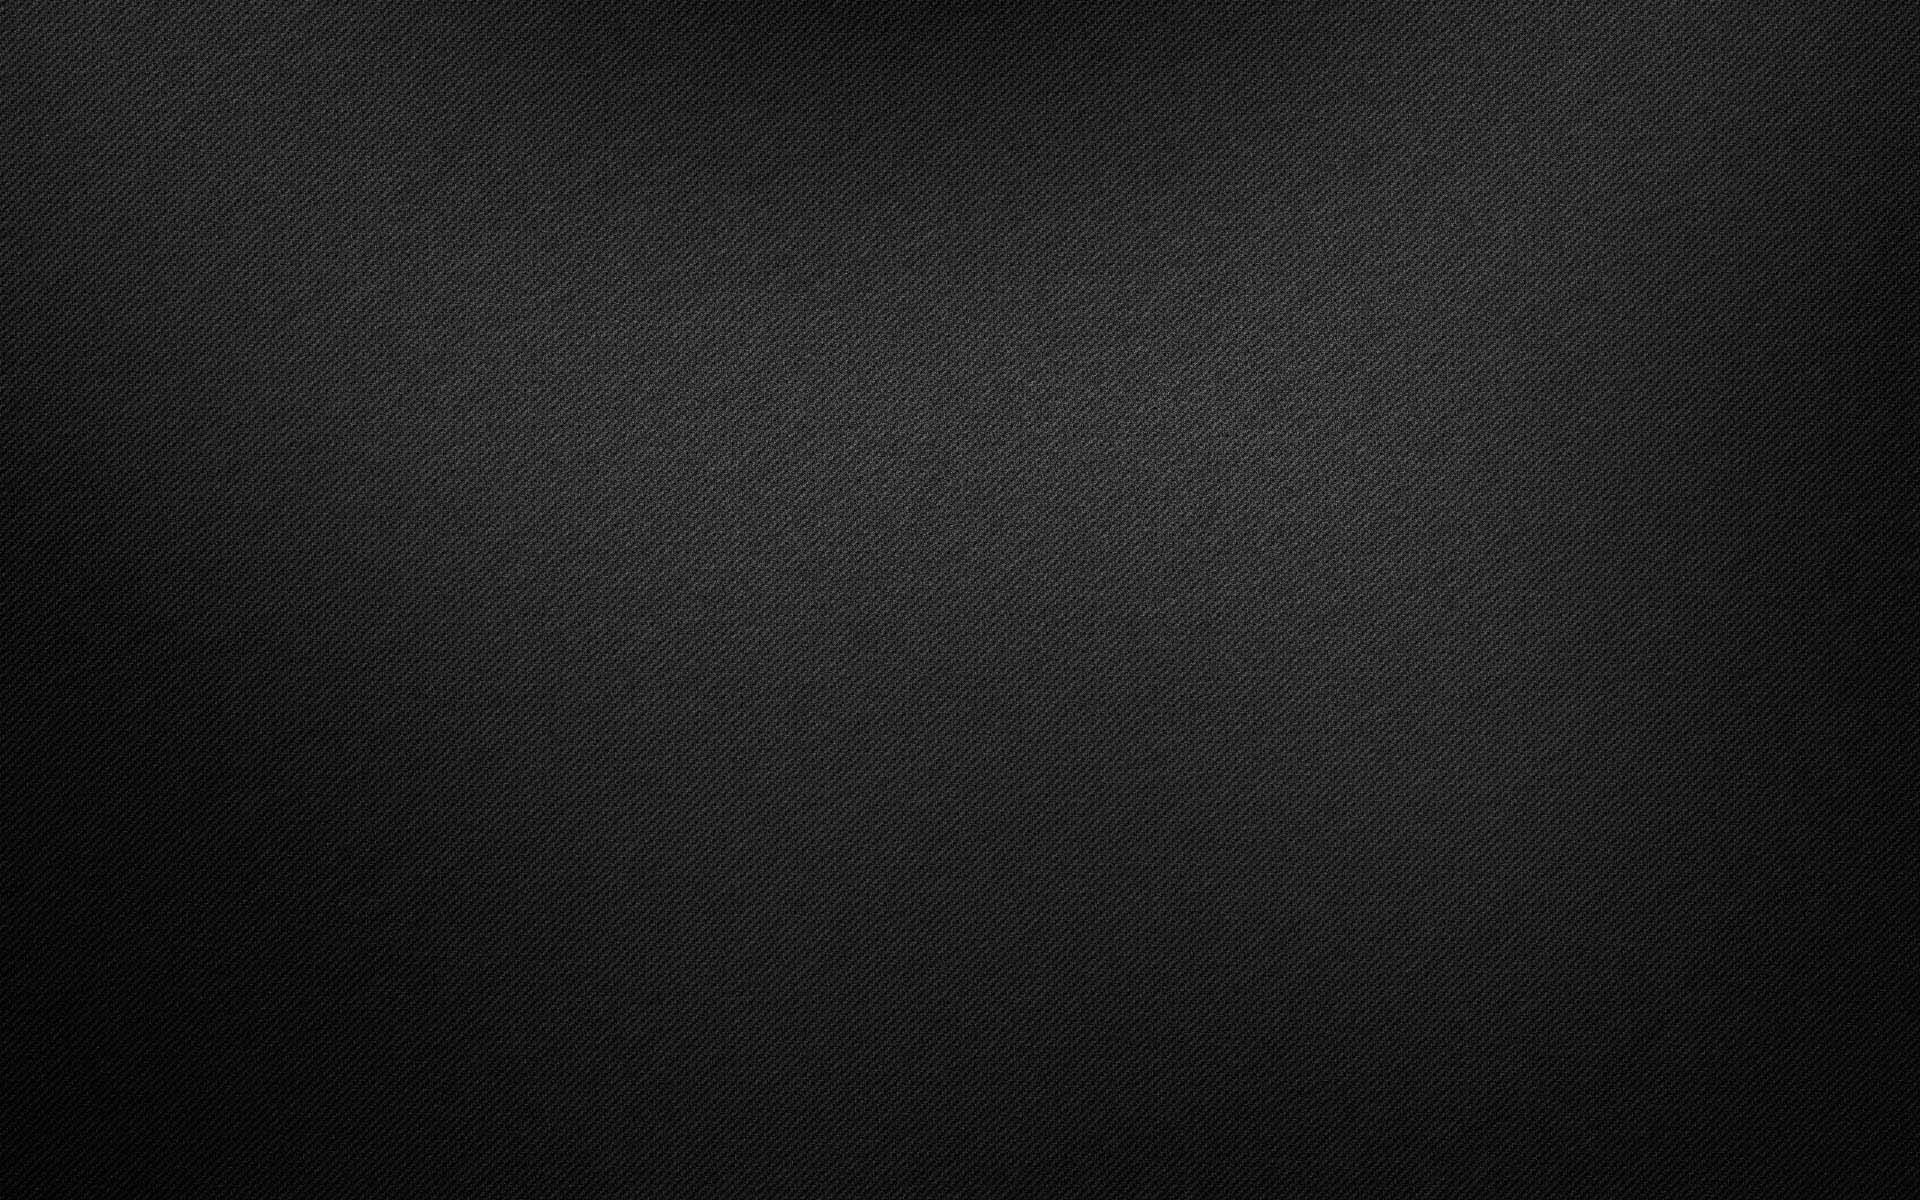 Black Denim Background wallpapers Black Denim Background stock 1920x1200